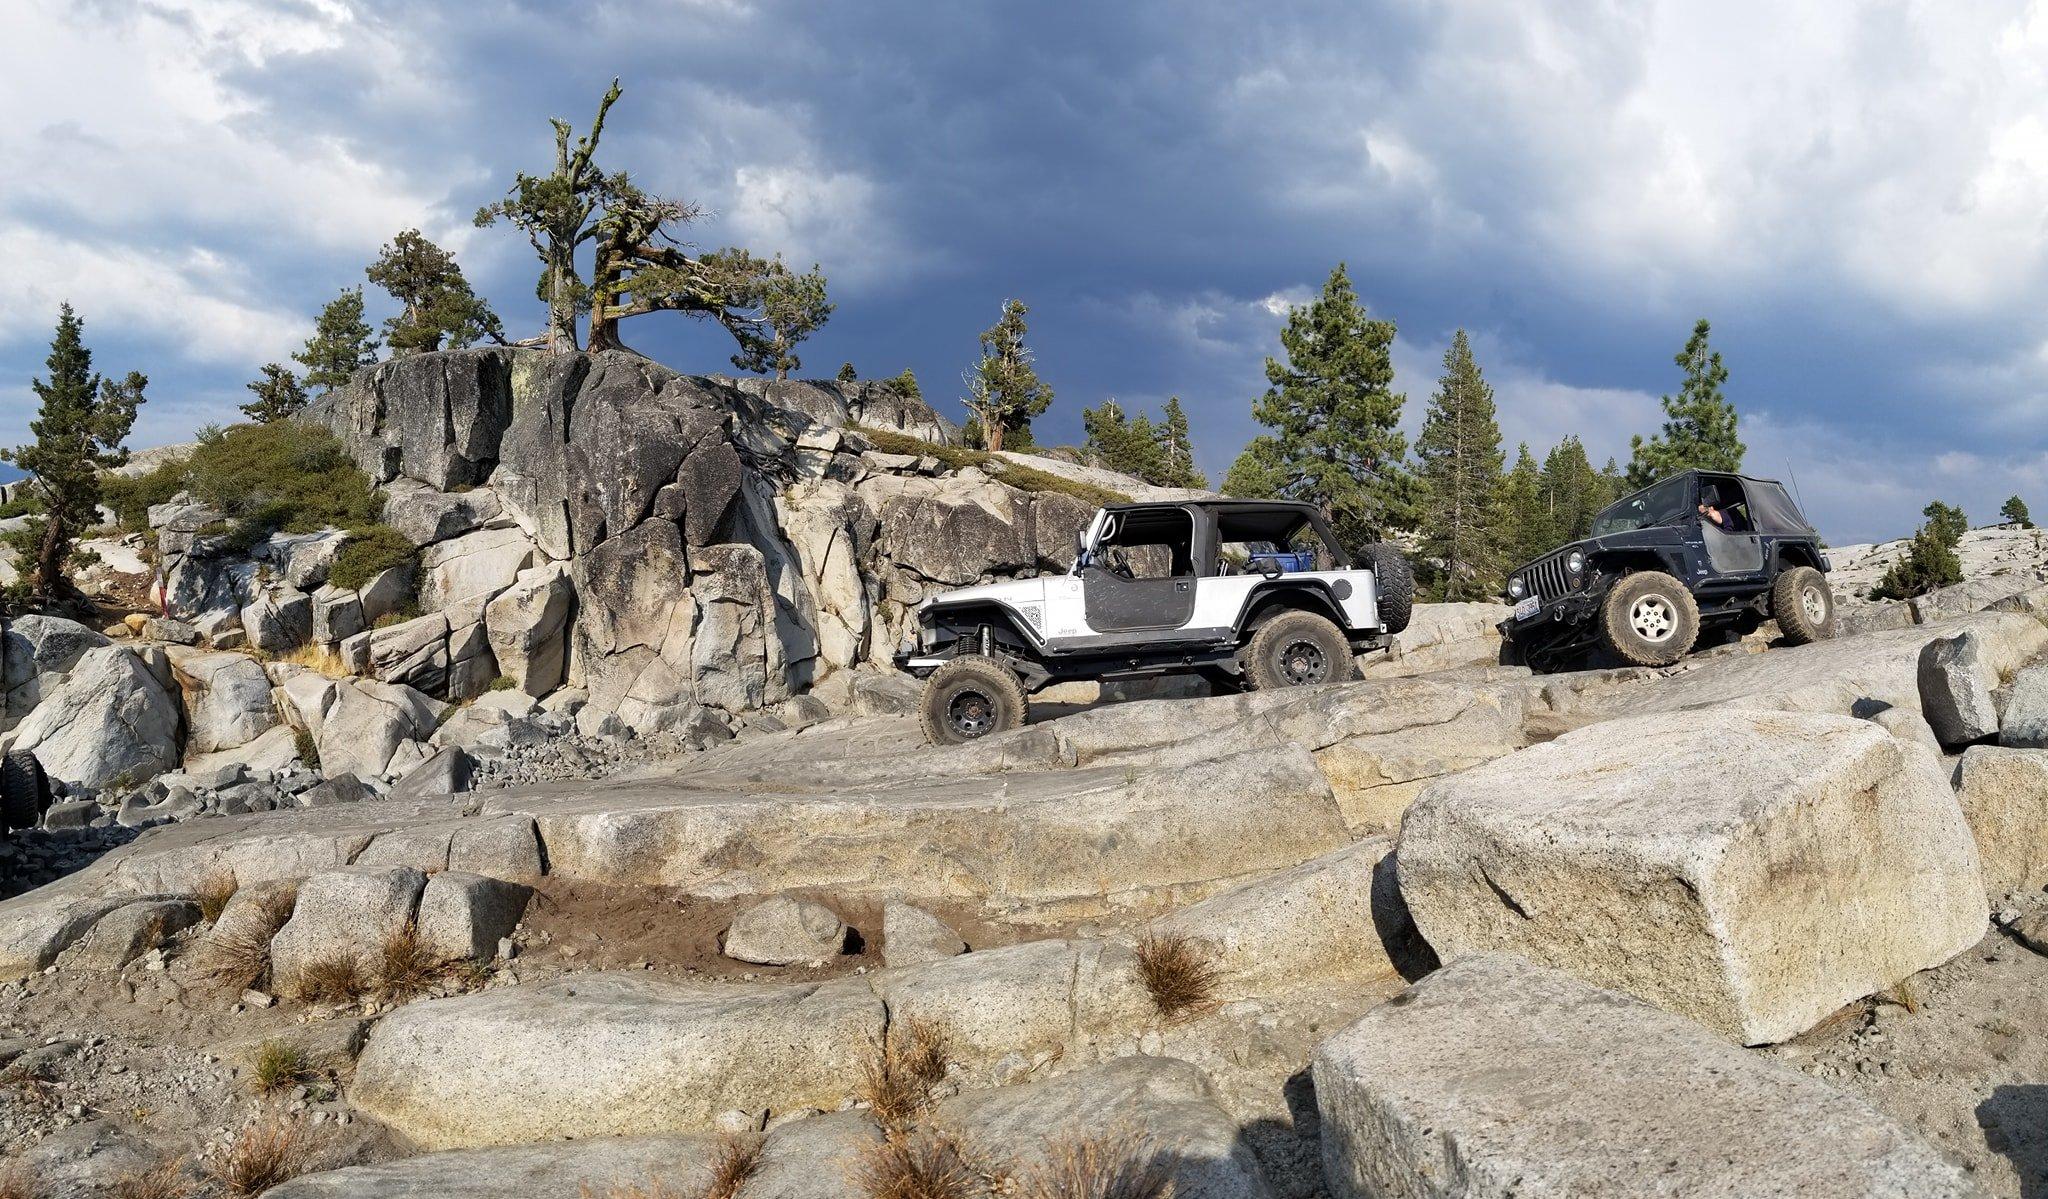 TJ and LJ navigating large rocks on the Rubicon Trail